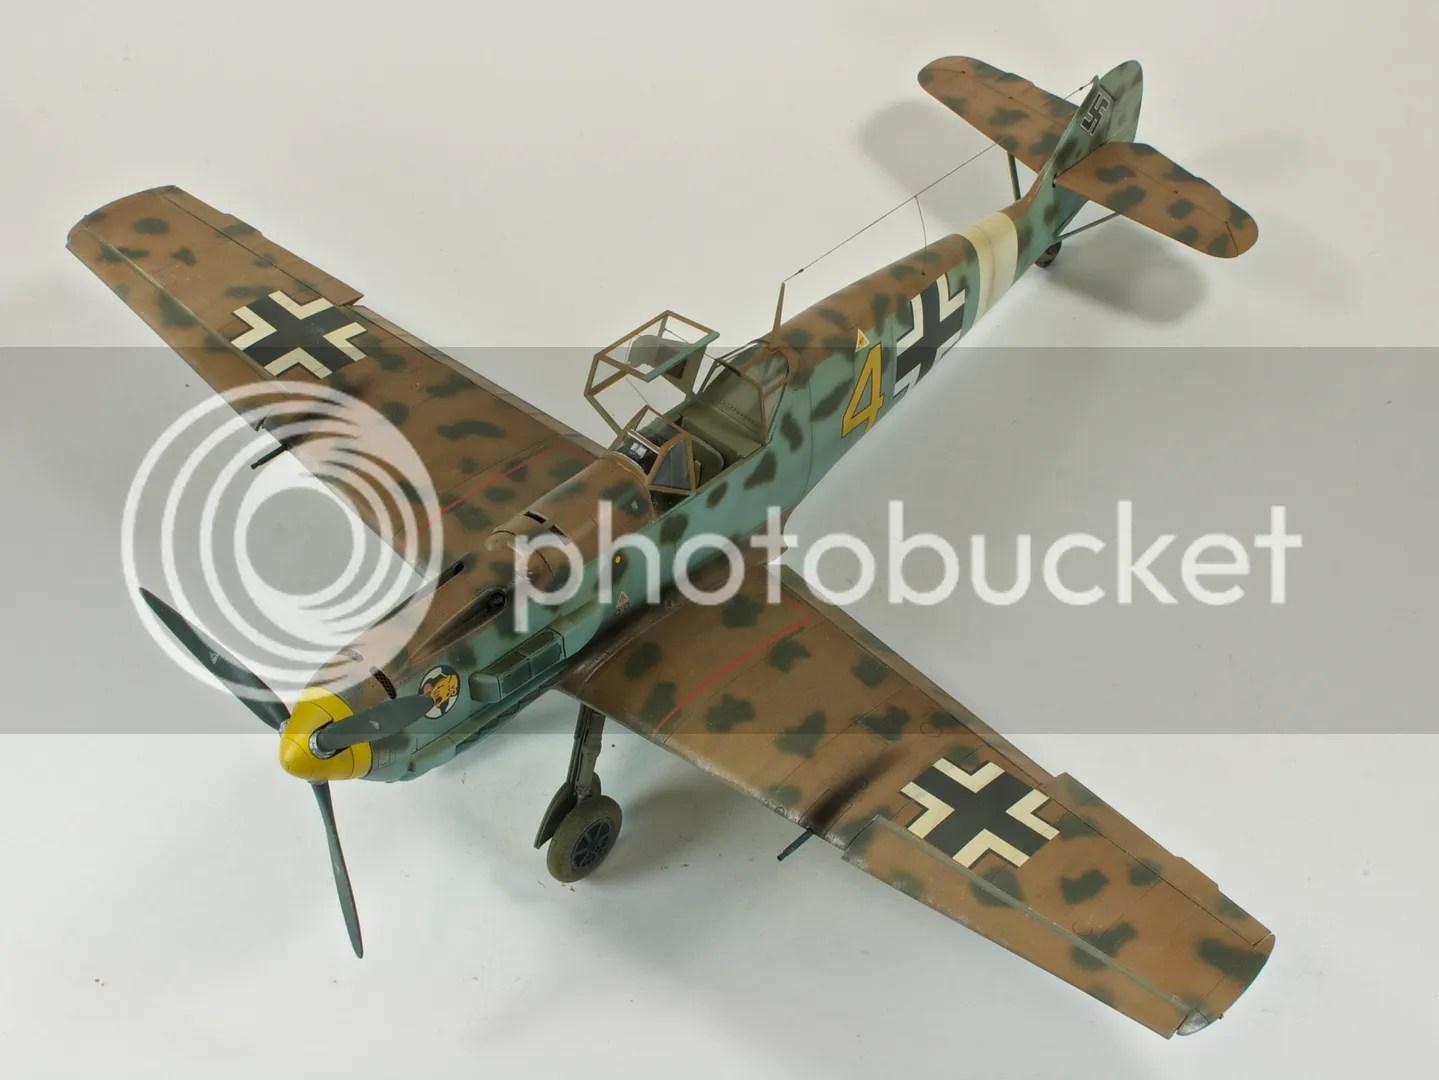 1/32,2011,Eduard,Bf 109E-7 Trop,Nikon D300s,February,scale models